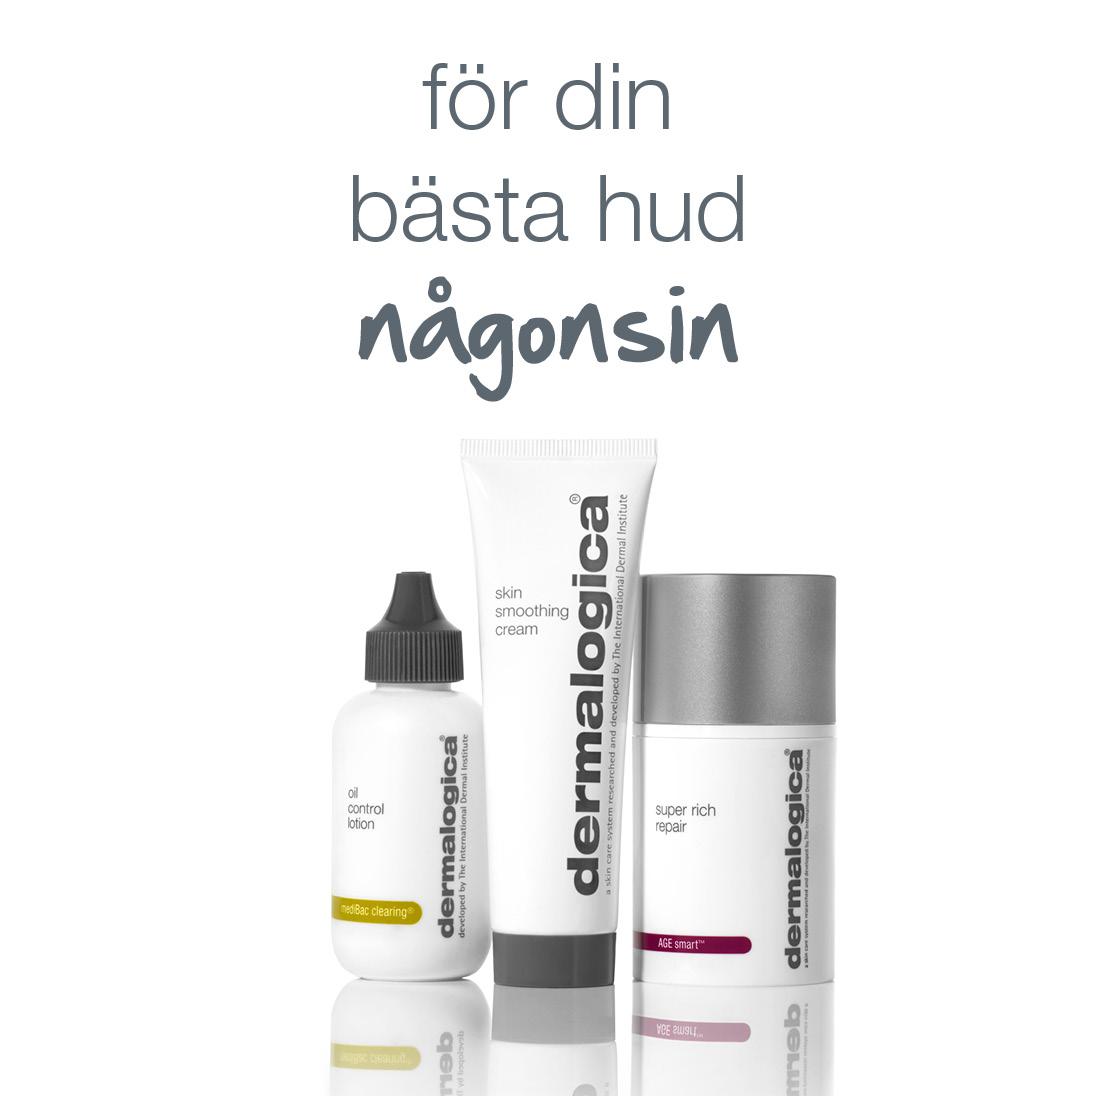 http://www.knopphudterapeut.se/wp-content/uploads/2017/03/din-bästa-hud.jpg